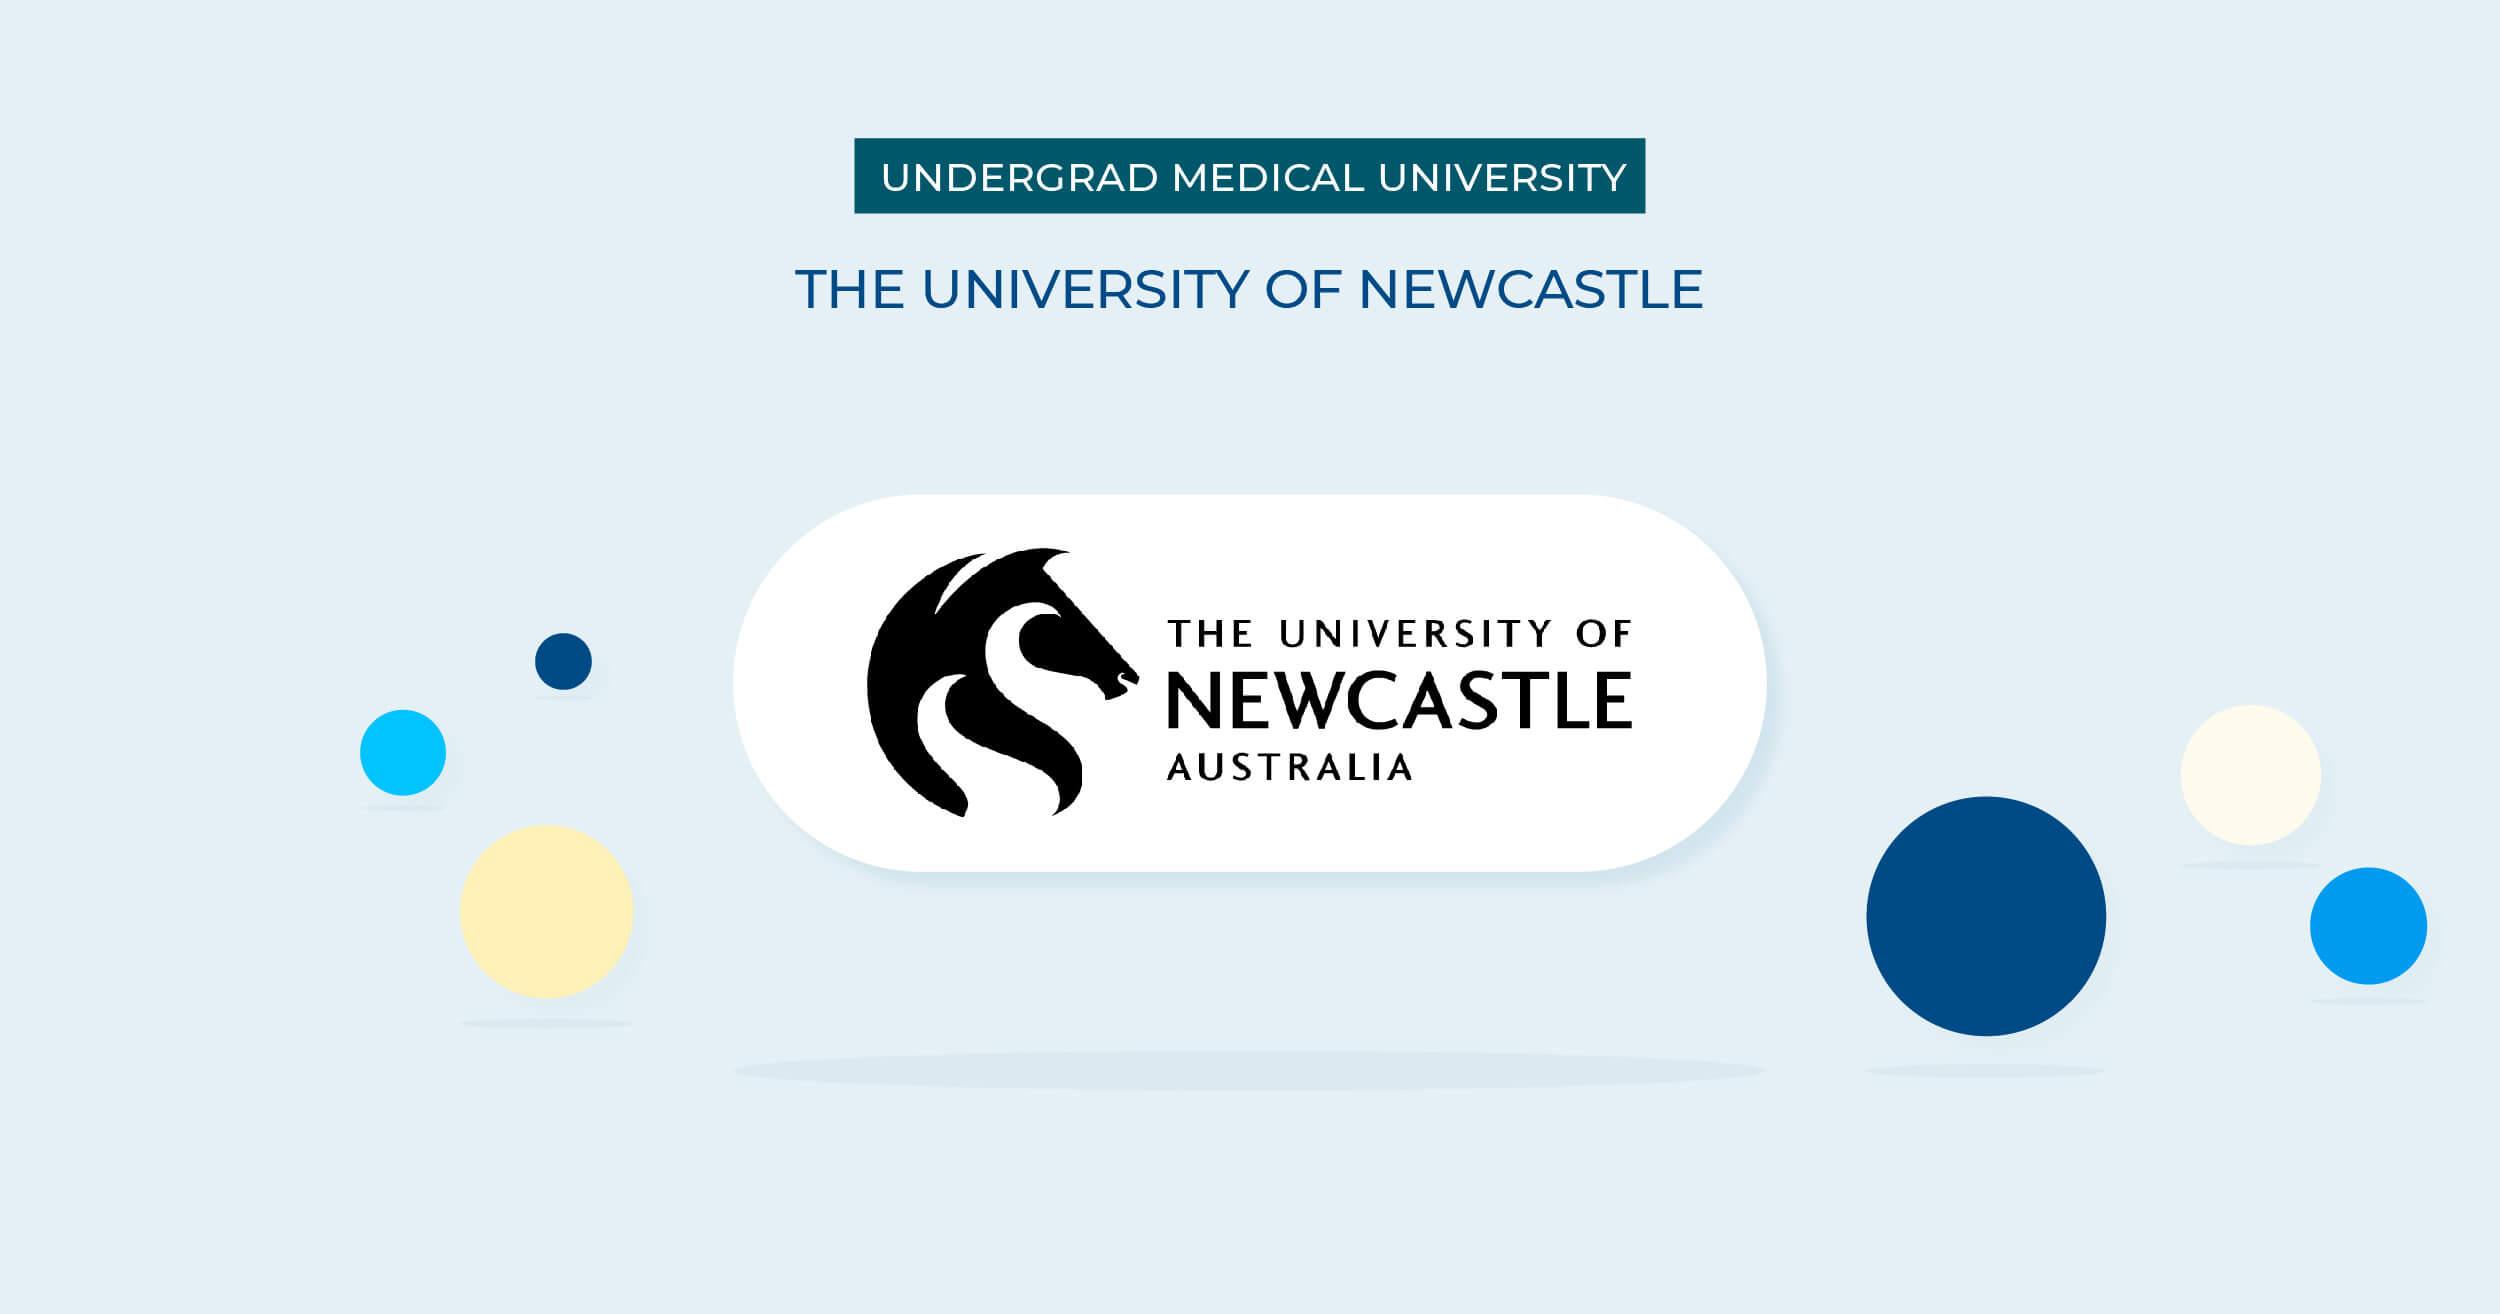 University of Newcastle Undergraduate Medicine Australia